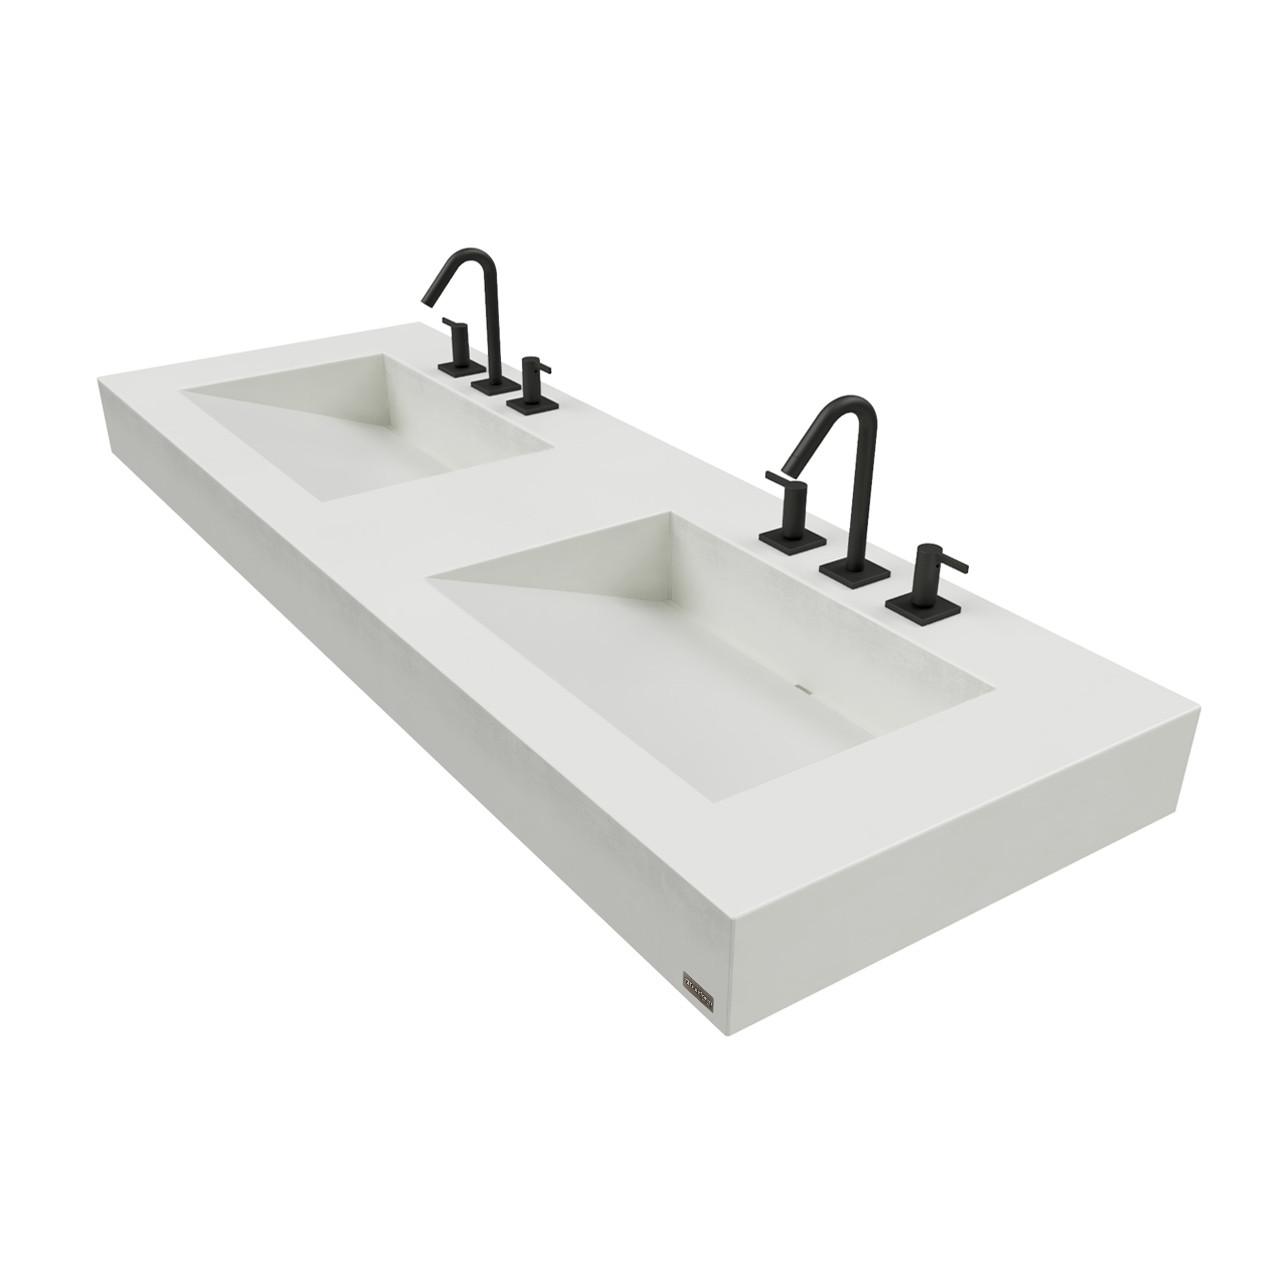 Trueform Ada Floating Concrete Bathroom Sink